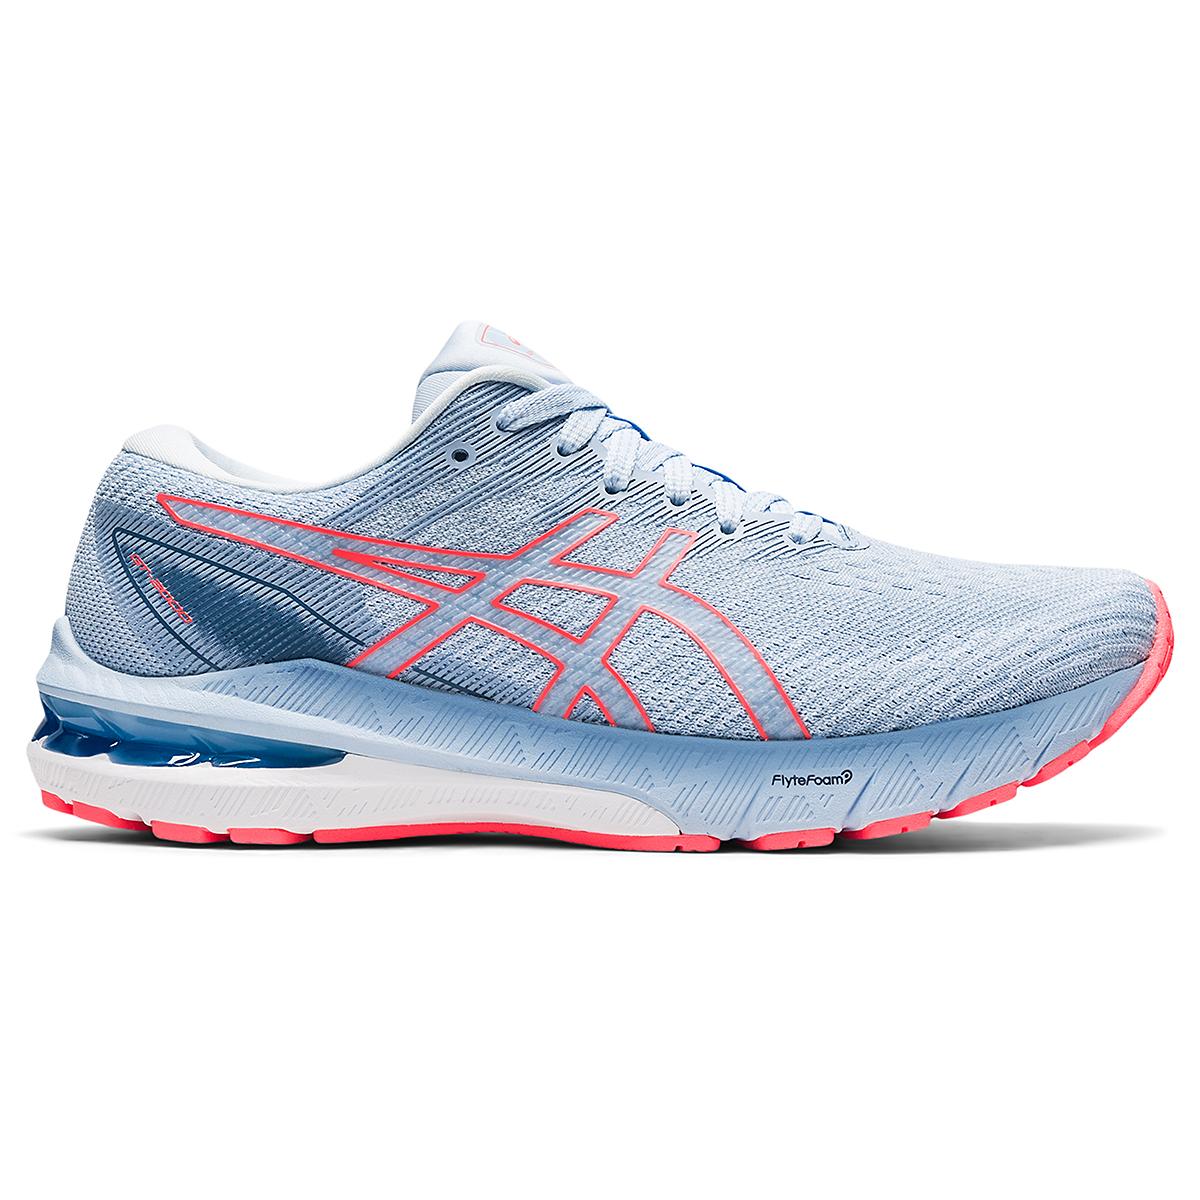 Women's Asics GT-2000 10 Running Shoe - Color: Mist/Blazing Coral - Size: 5 - Width: Regular, Mist/Blazing Coral, large, image 1